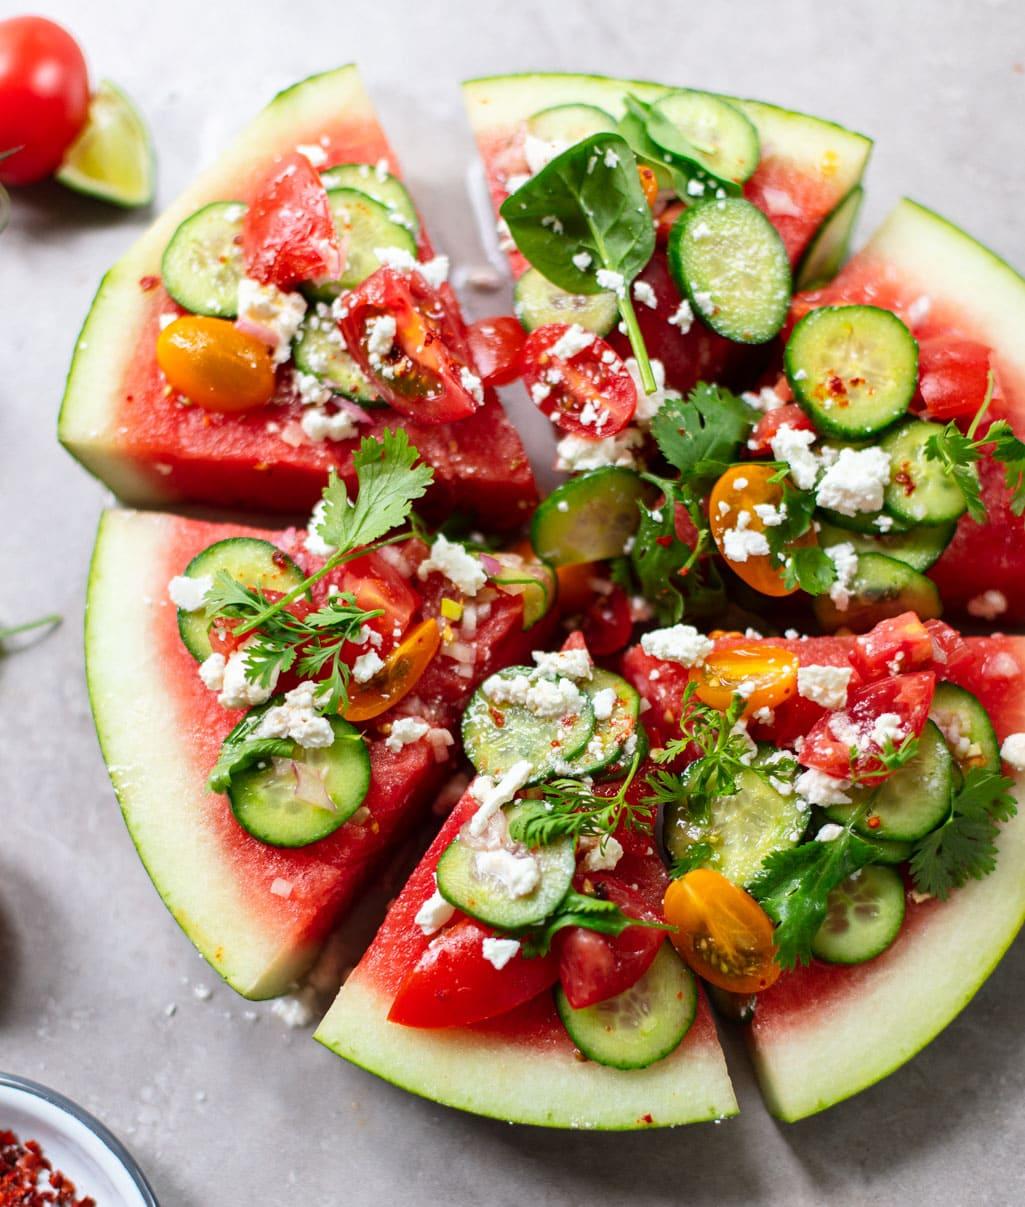 Watermelon, Cucumber and Feta Wedge Salad